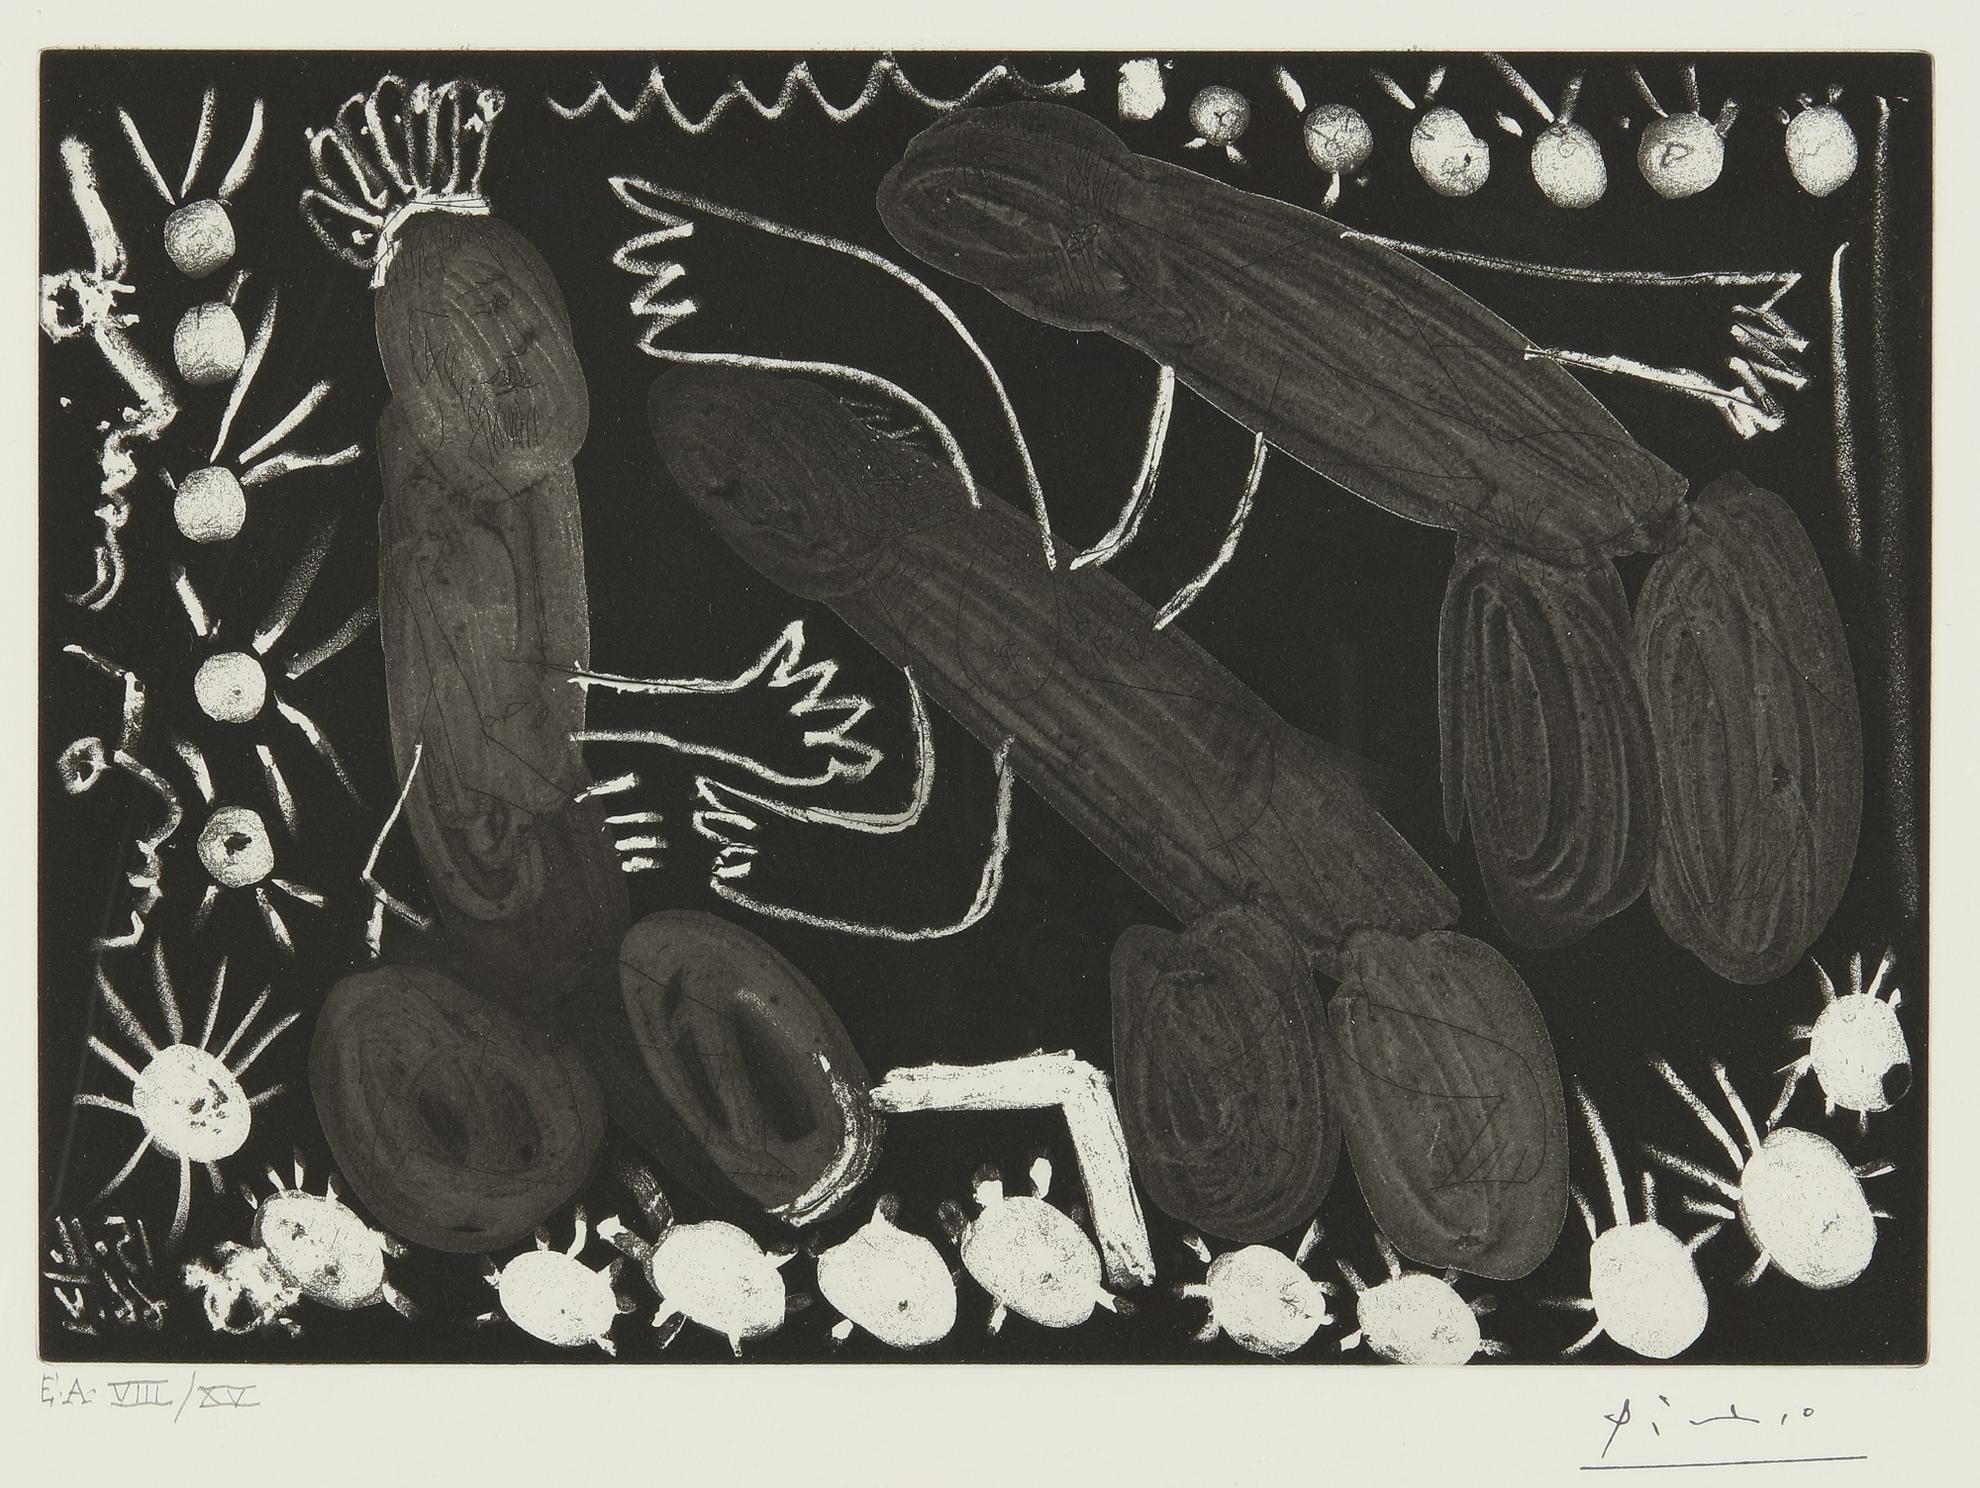 Pablo Picasso-Untitled: 15 Novembre 1966 V (B. 1417)-1966